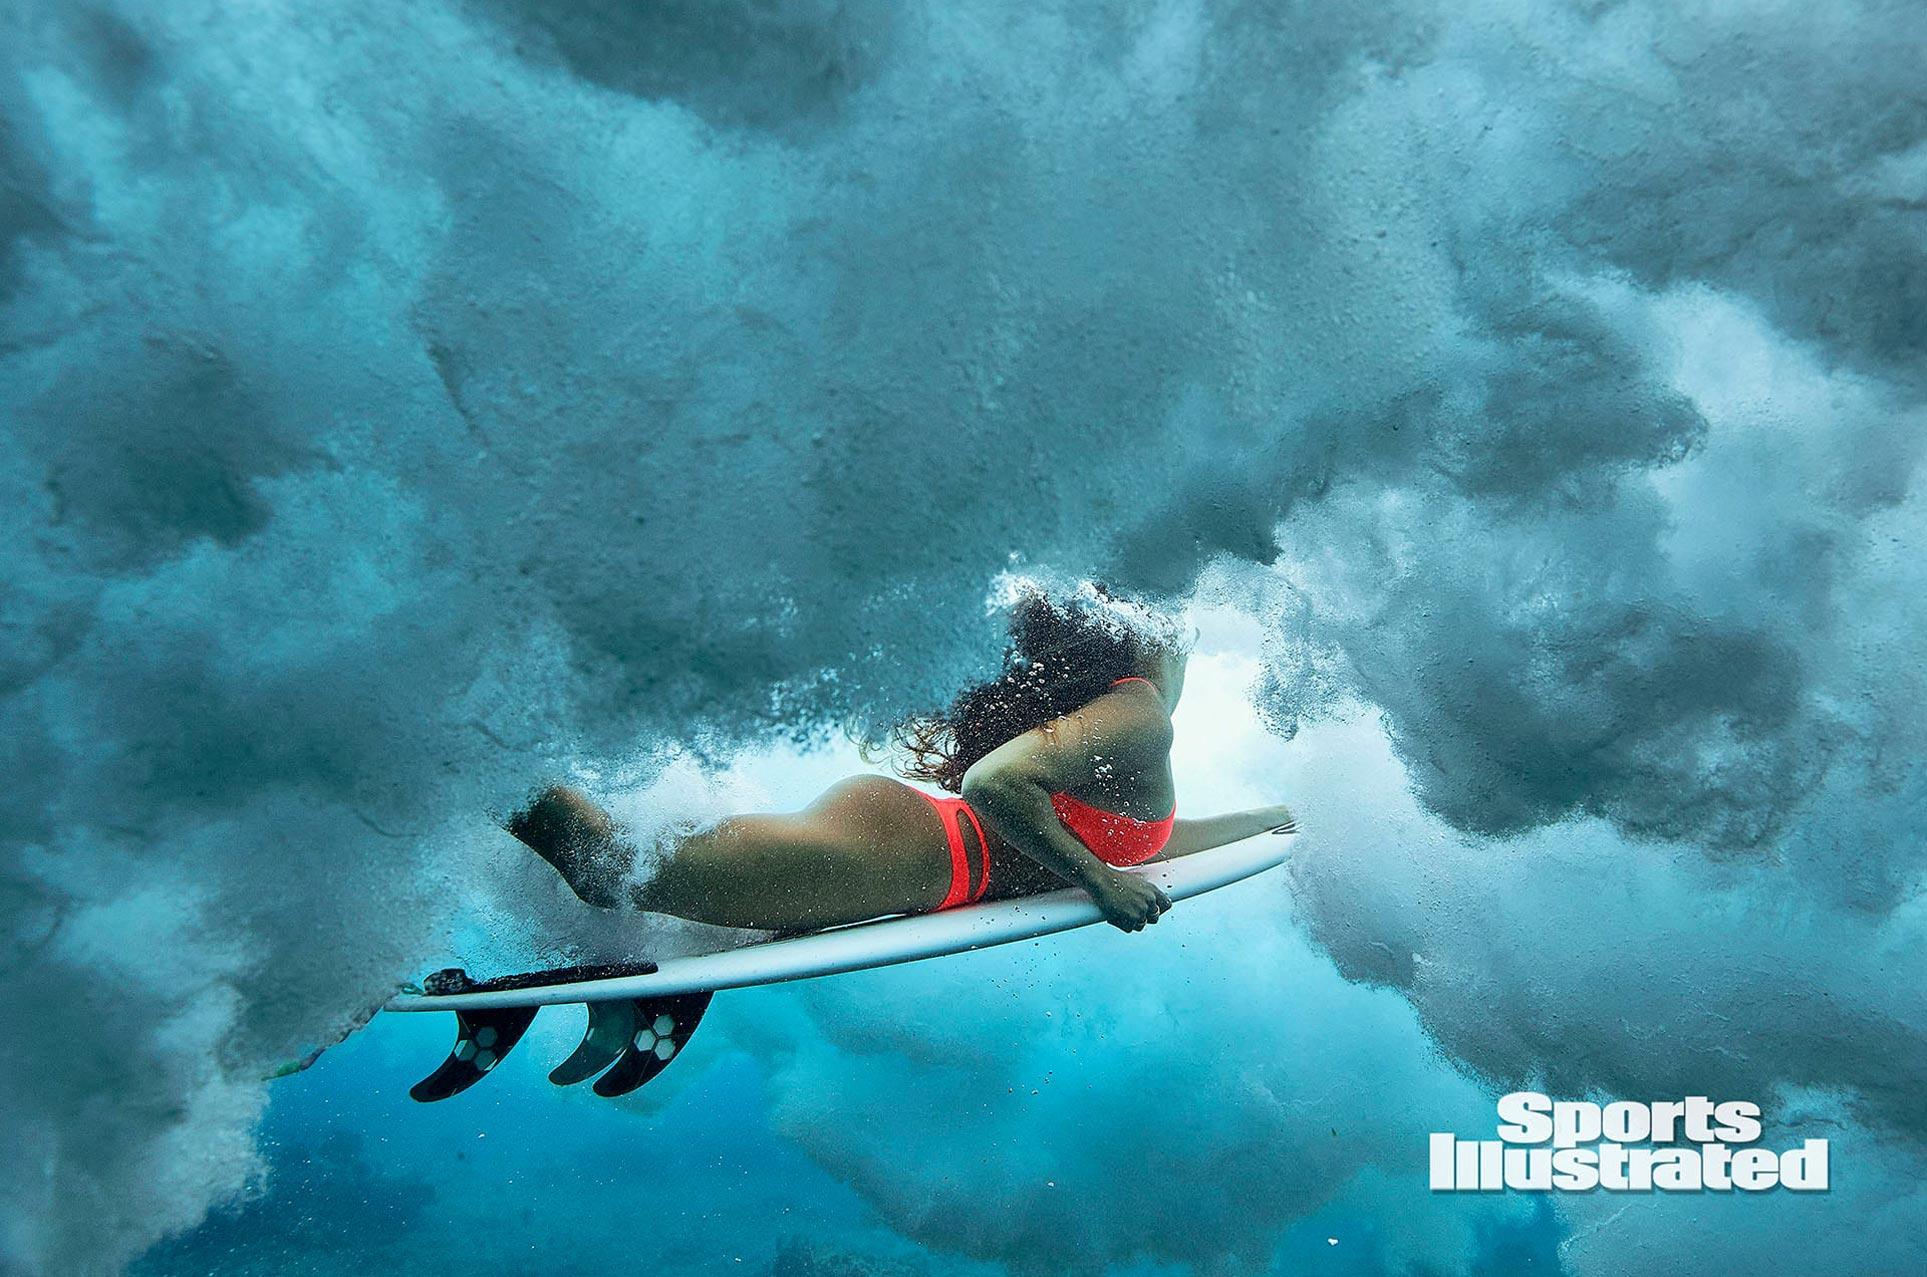 Малия Мануэль в каталоге купальников Sports Illustrated Swimsuit 2020 / фото 08